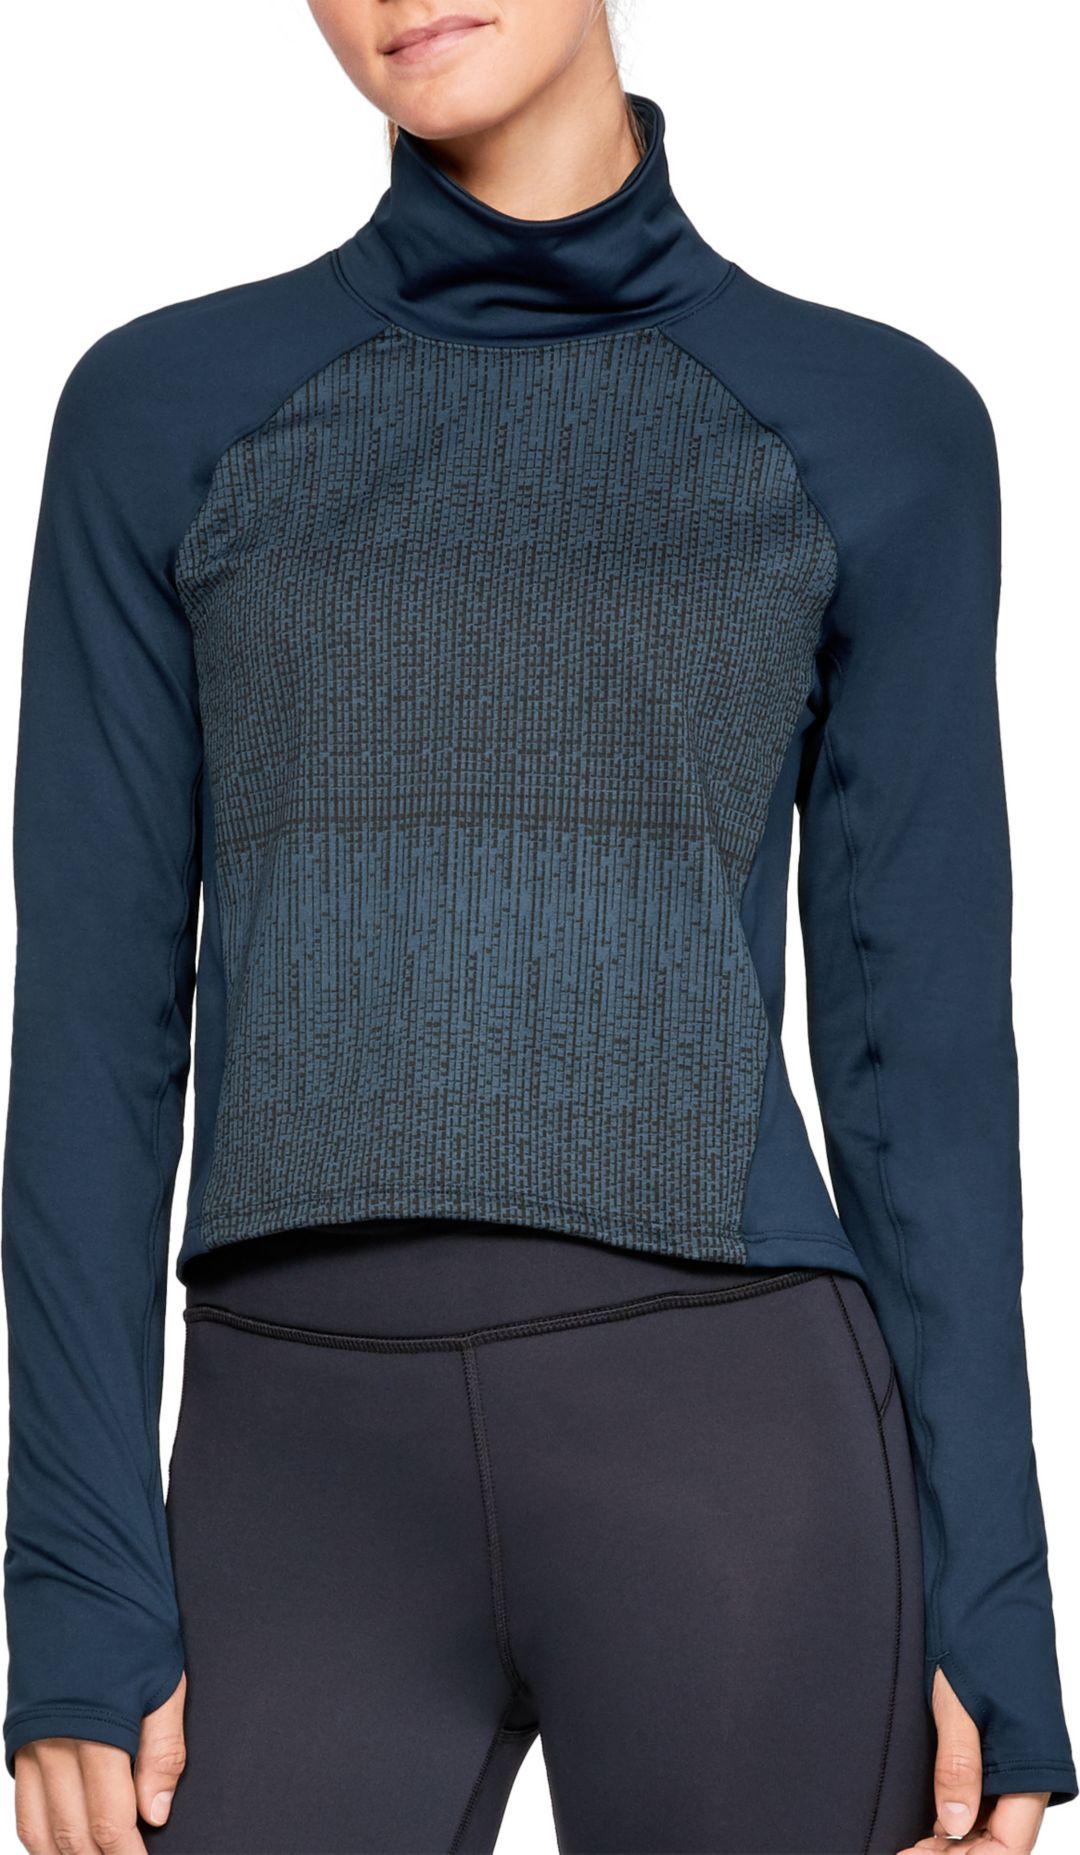 699c79ad Under Armour Women's ColdGear Cozy Mock Neck Long Sleeve Shirt